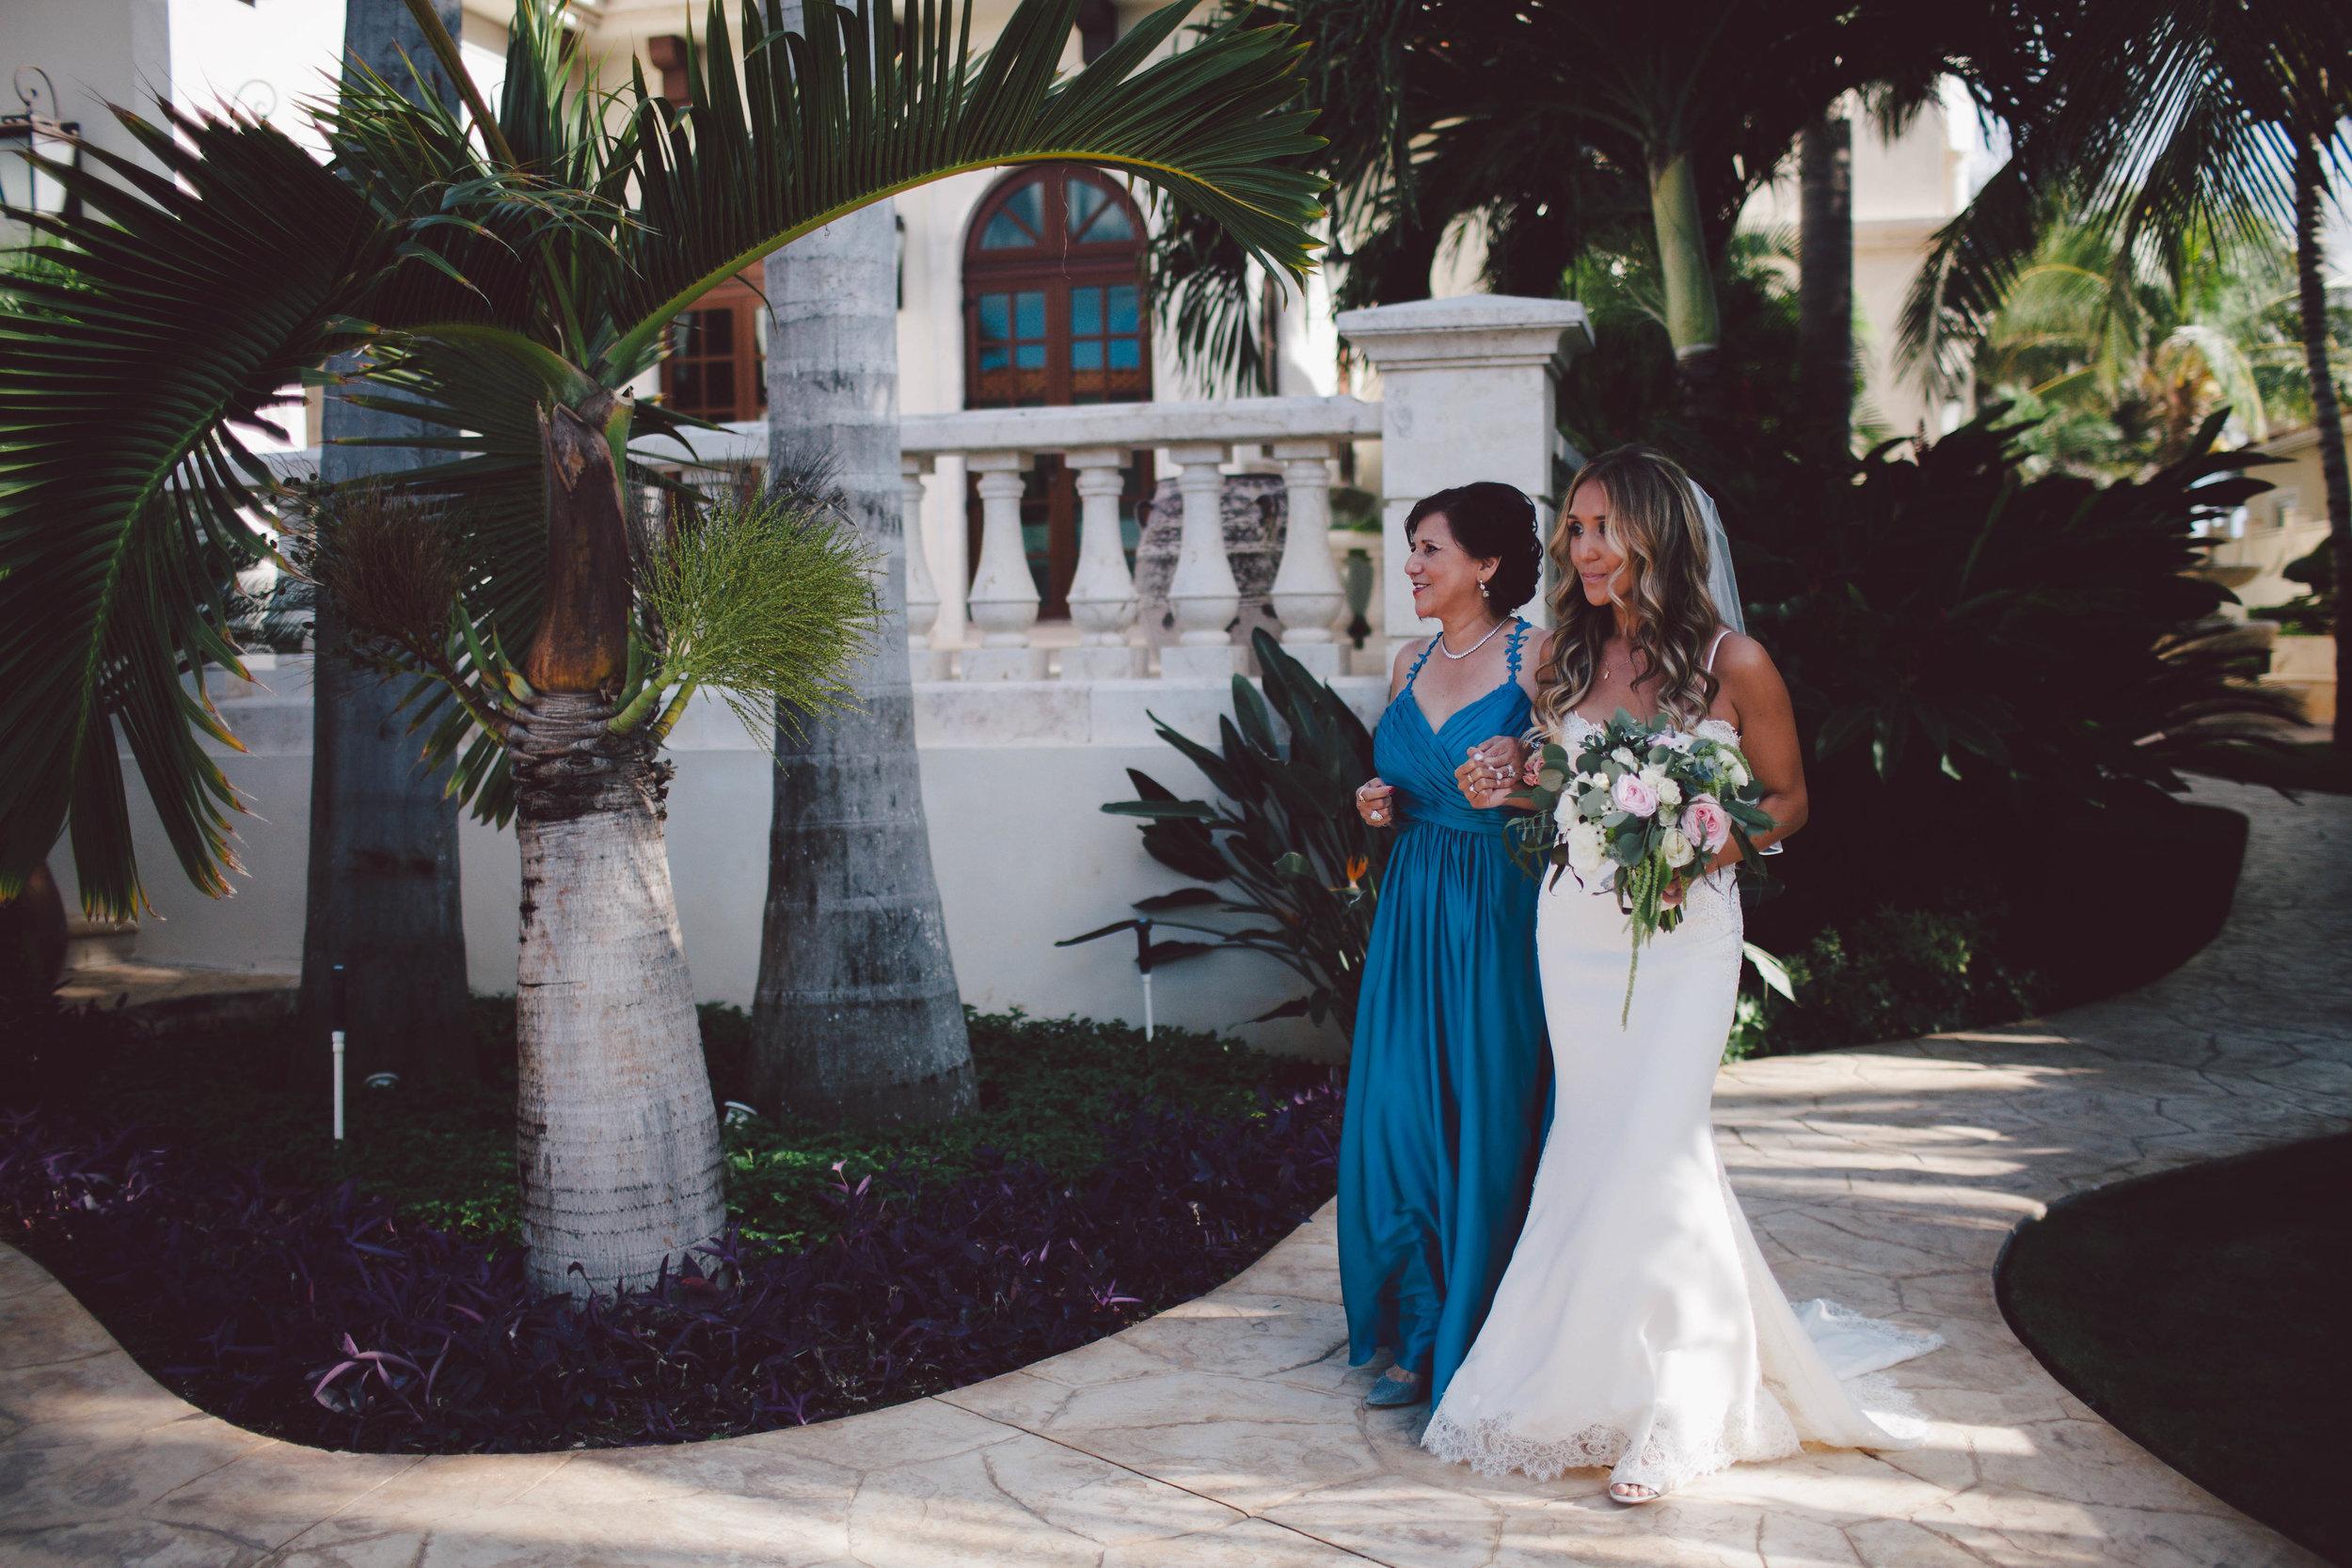 mexico_wedding_cancun_villa_la_joya_evangeline_lane_047.jpg